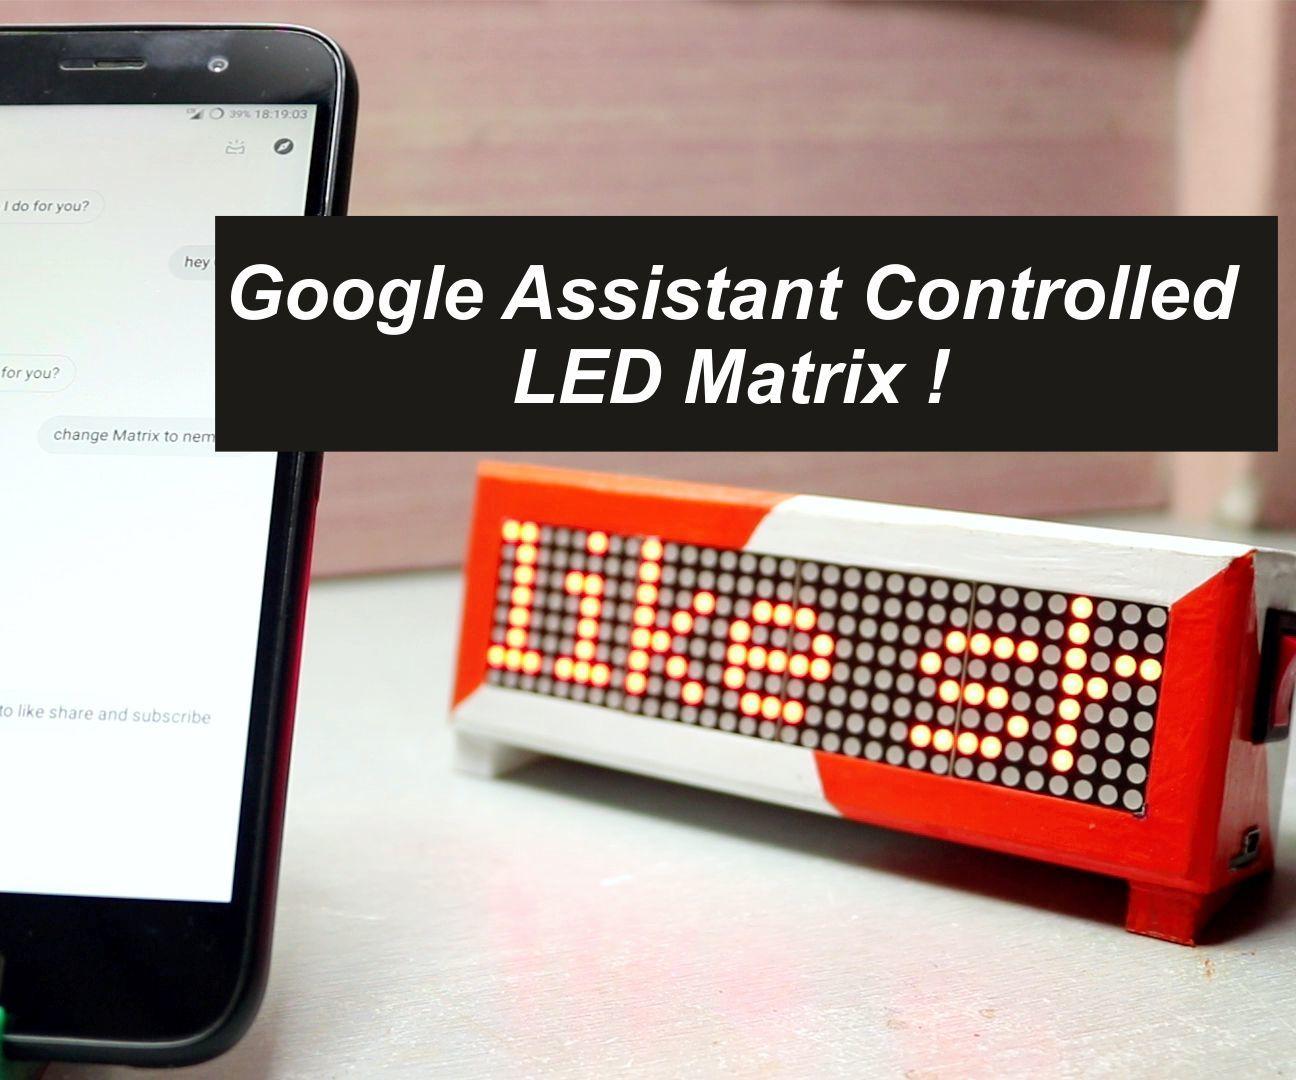 Google Assistant Controlled LED Matrix !